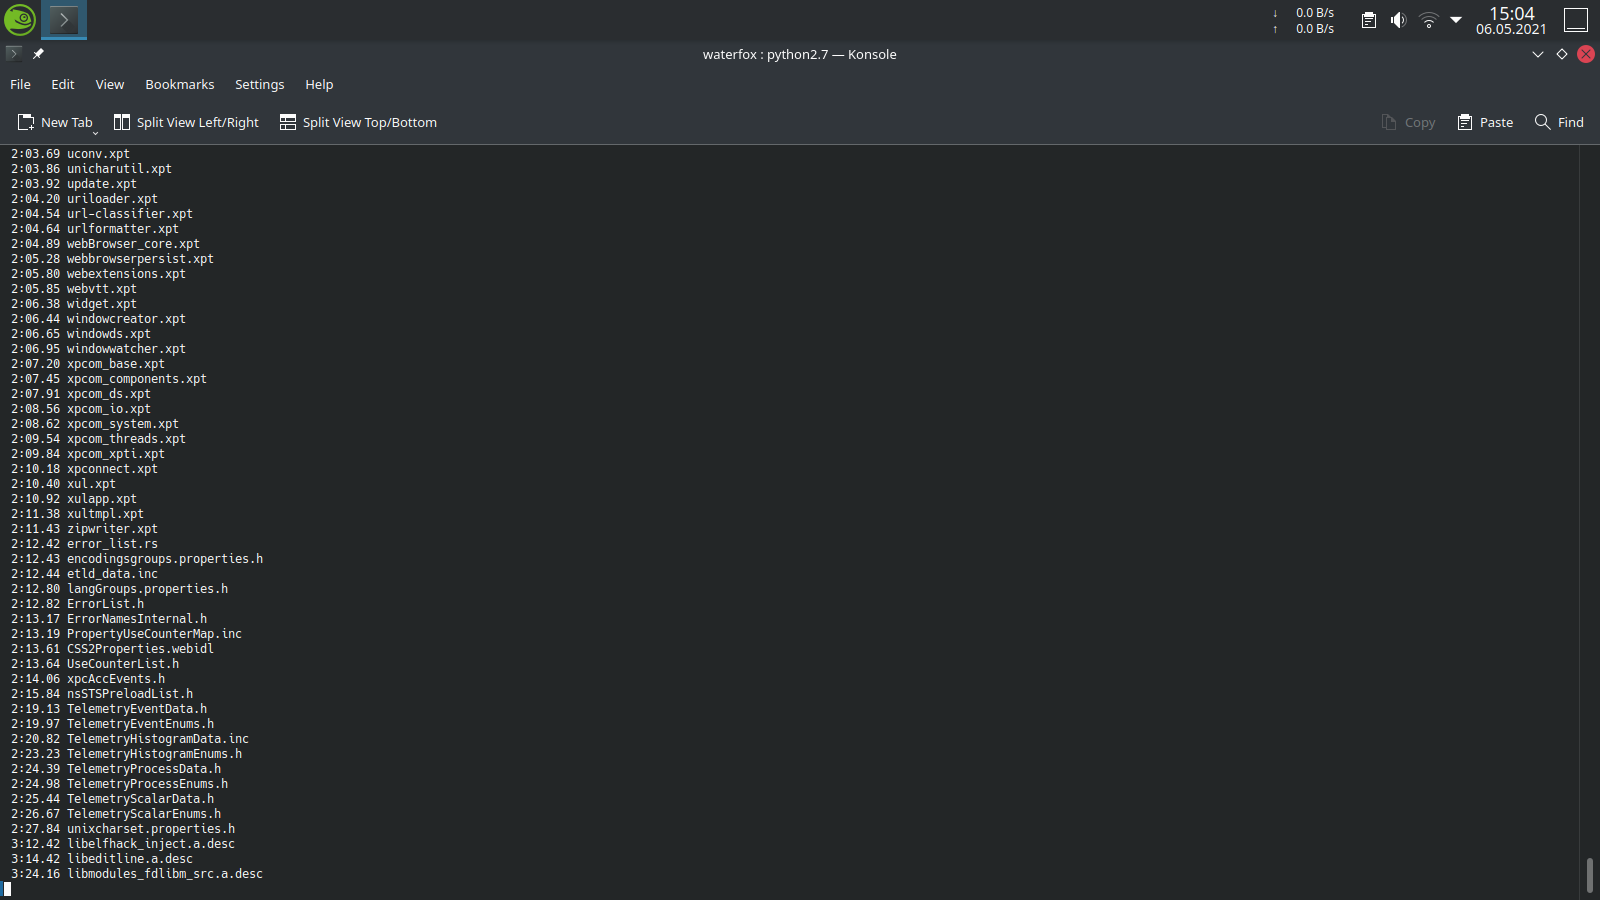 https://cloud-k7qo6tzo4-hack-club-bot.vercel.app/0unknown-16.png